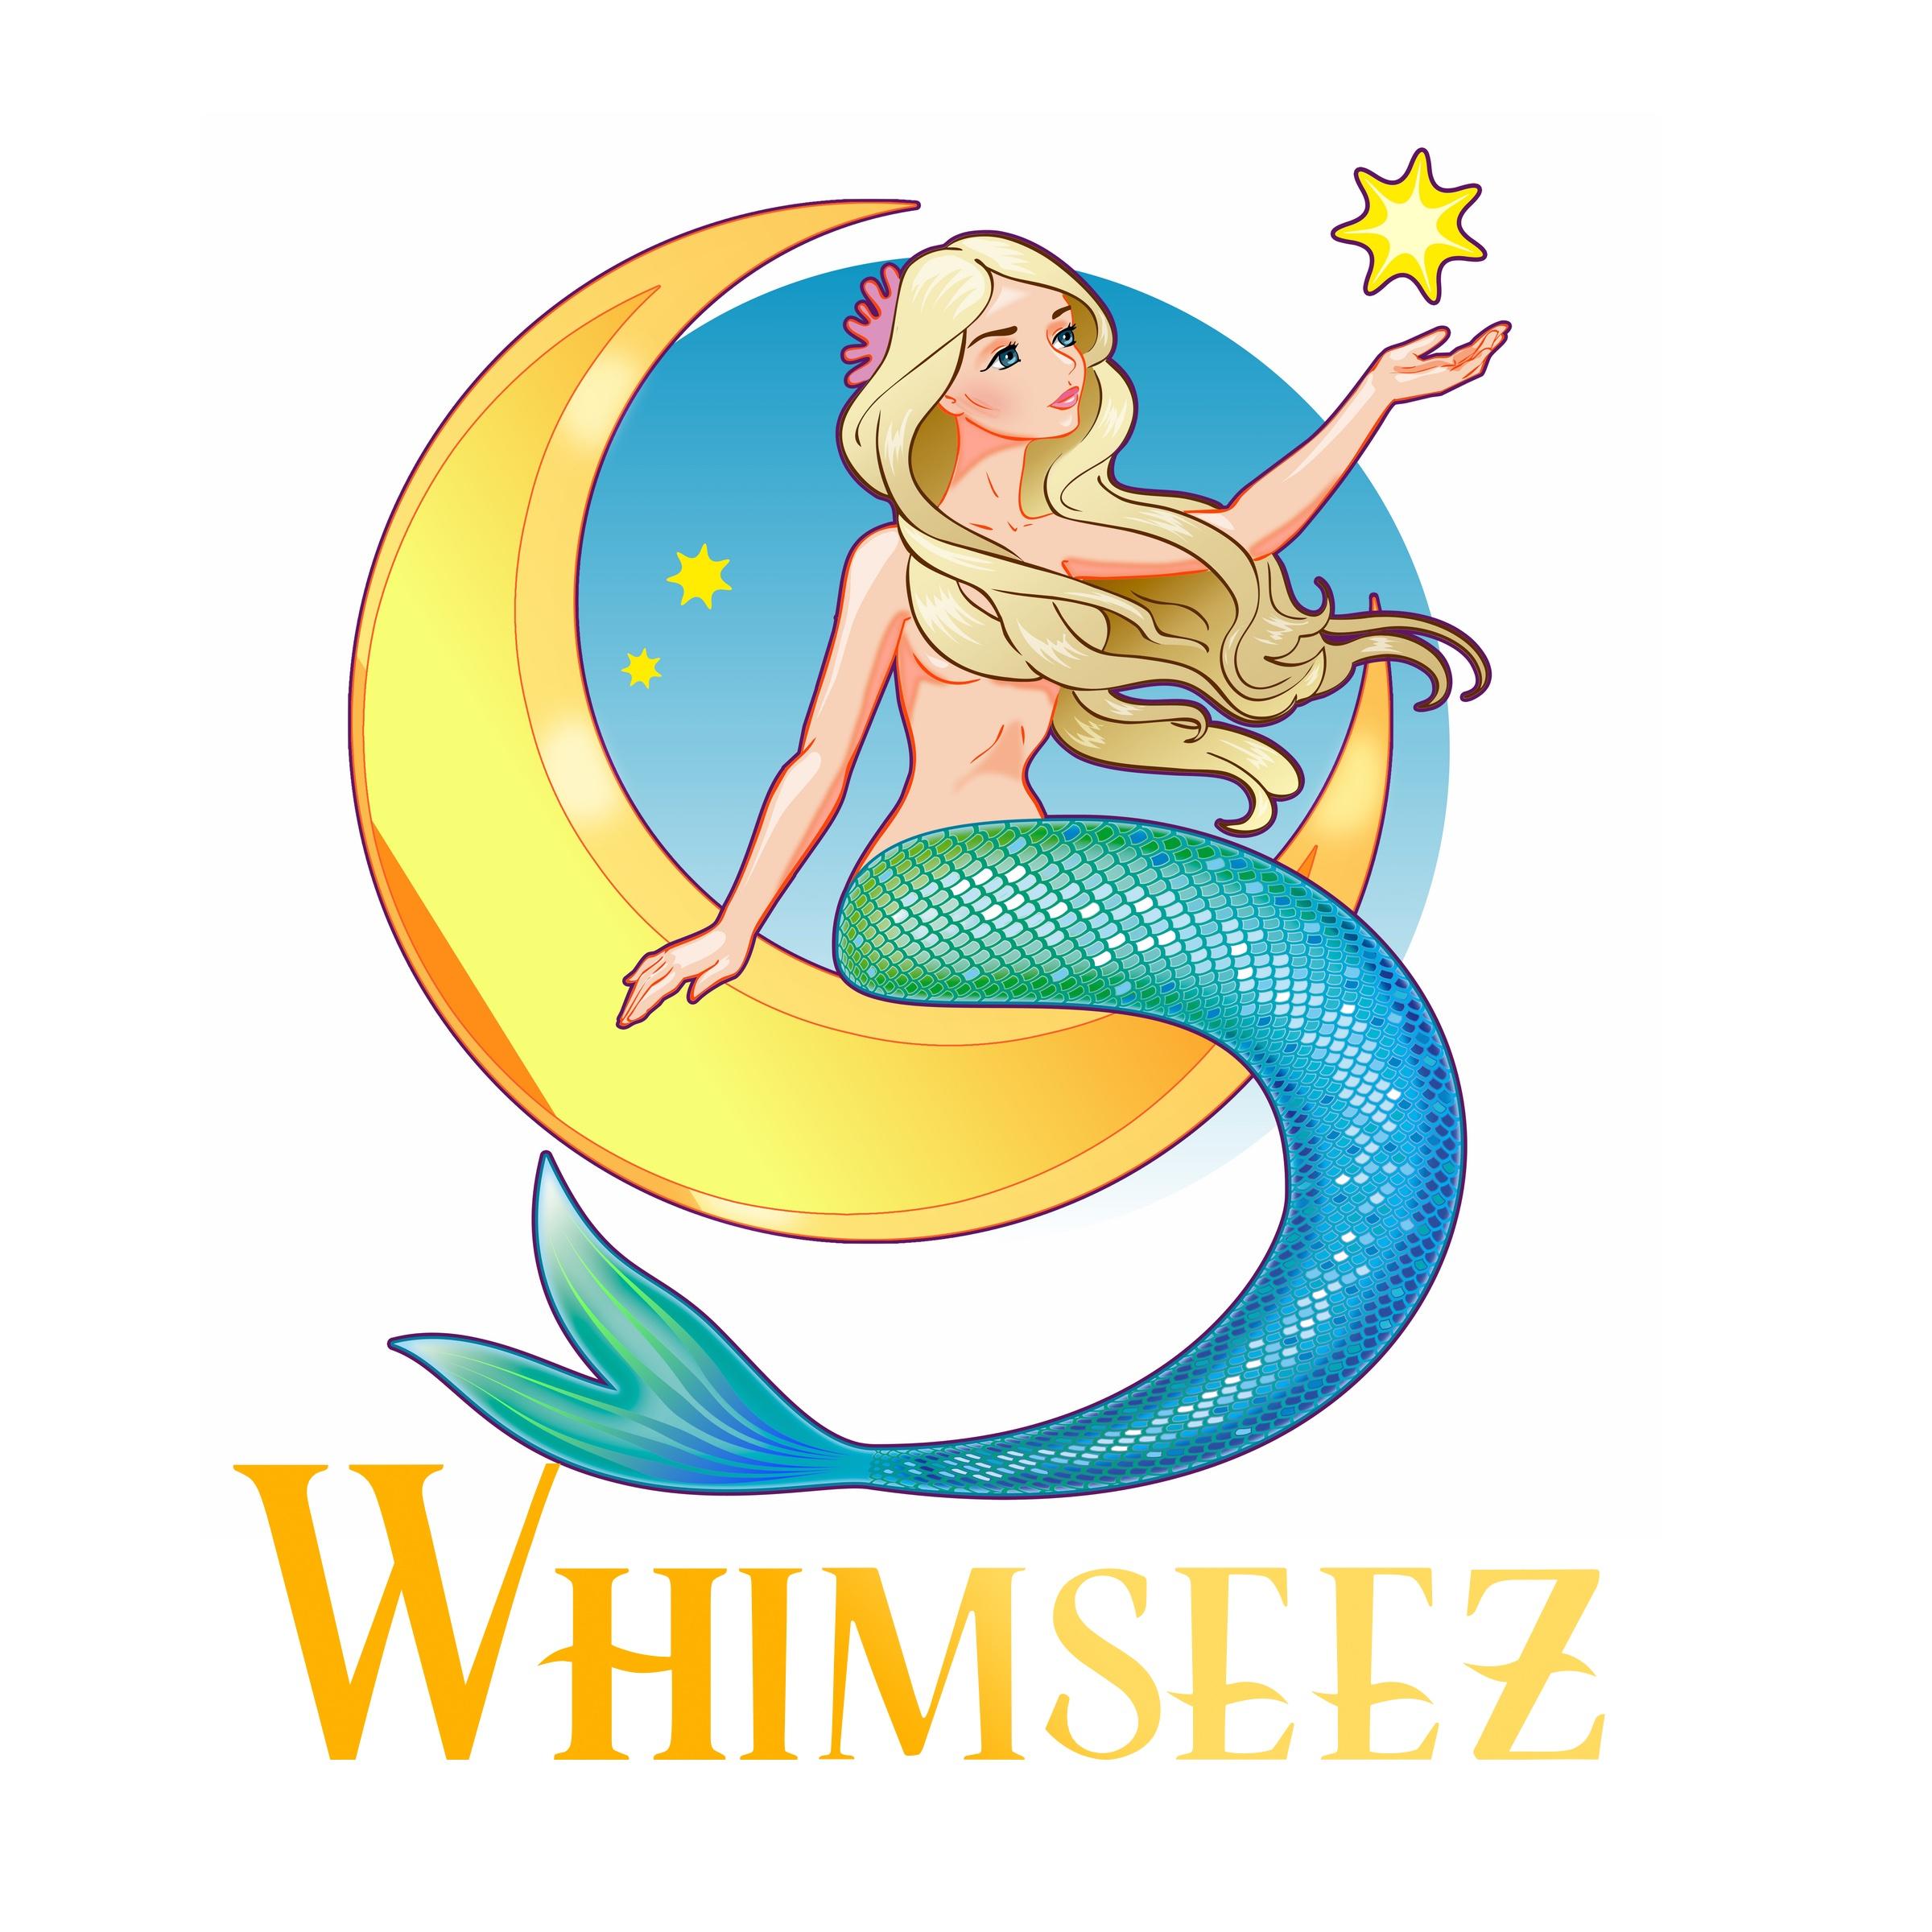 Mermaid clipart siren Design Mermaids Watercolor Whimseez Clipart